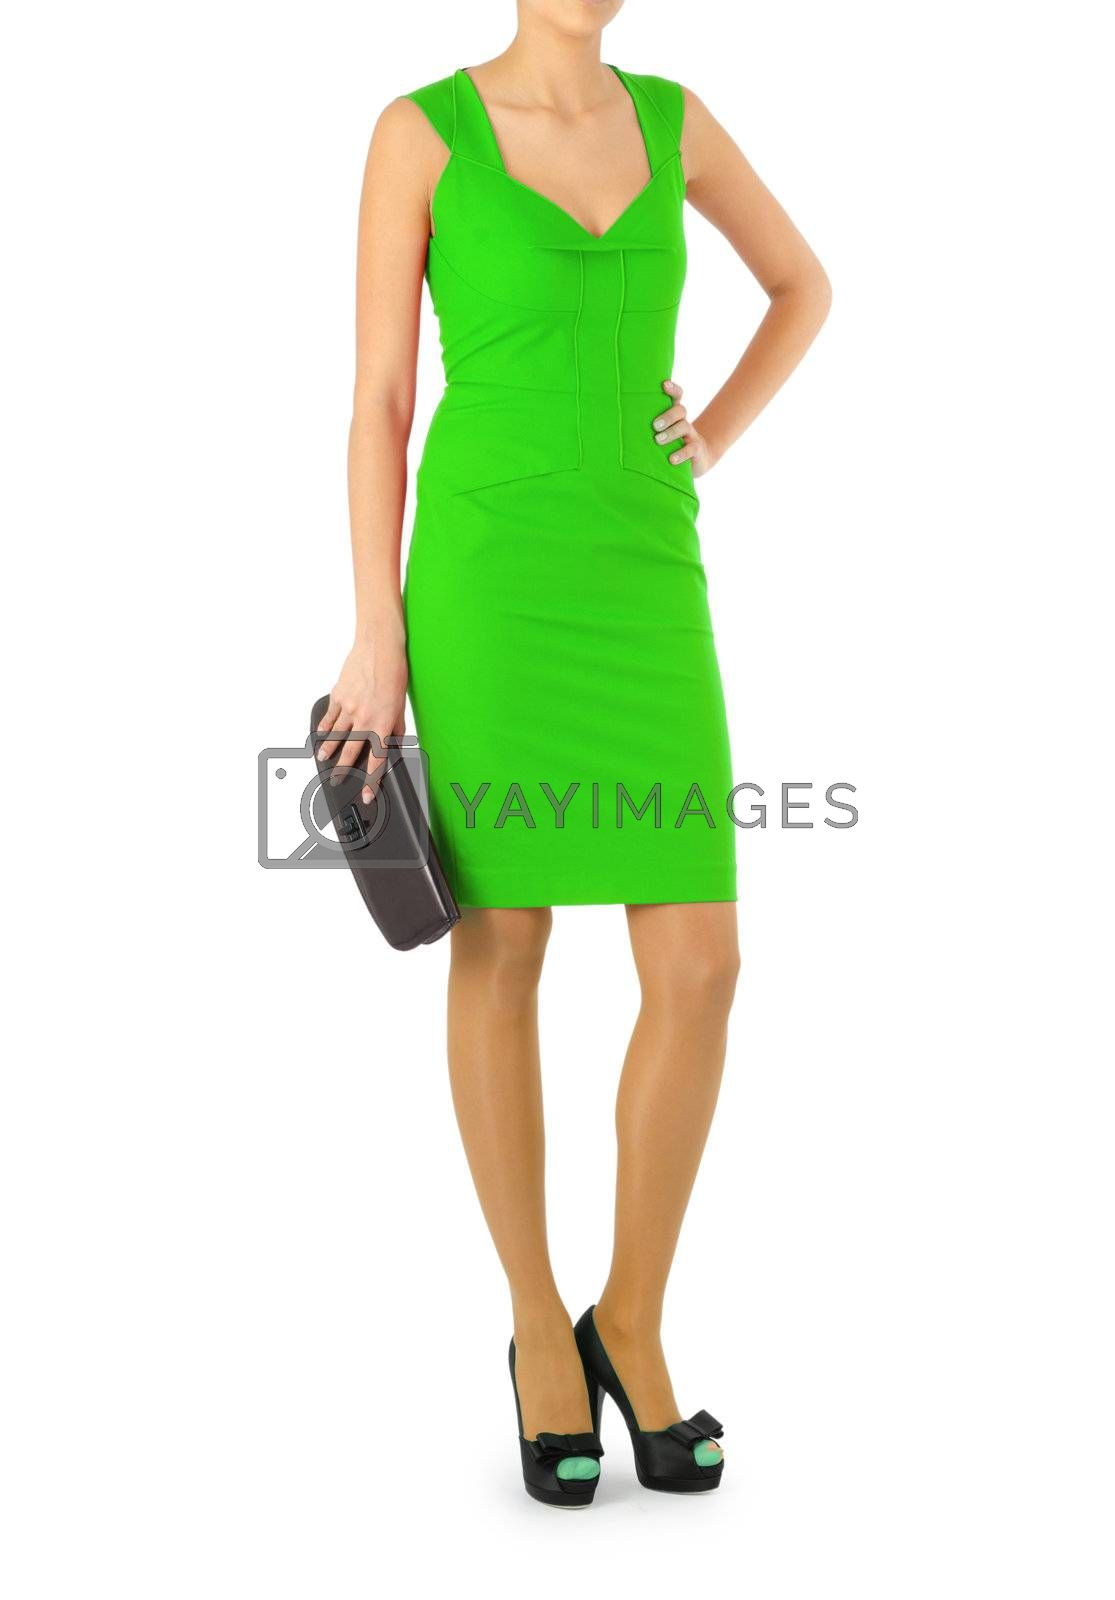 Attractive model in fashion concept by Elnur